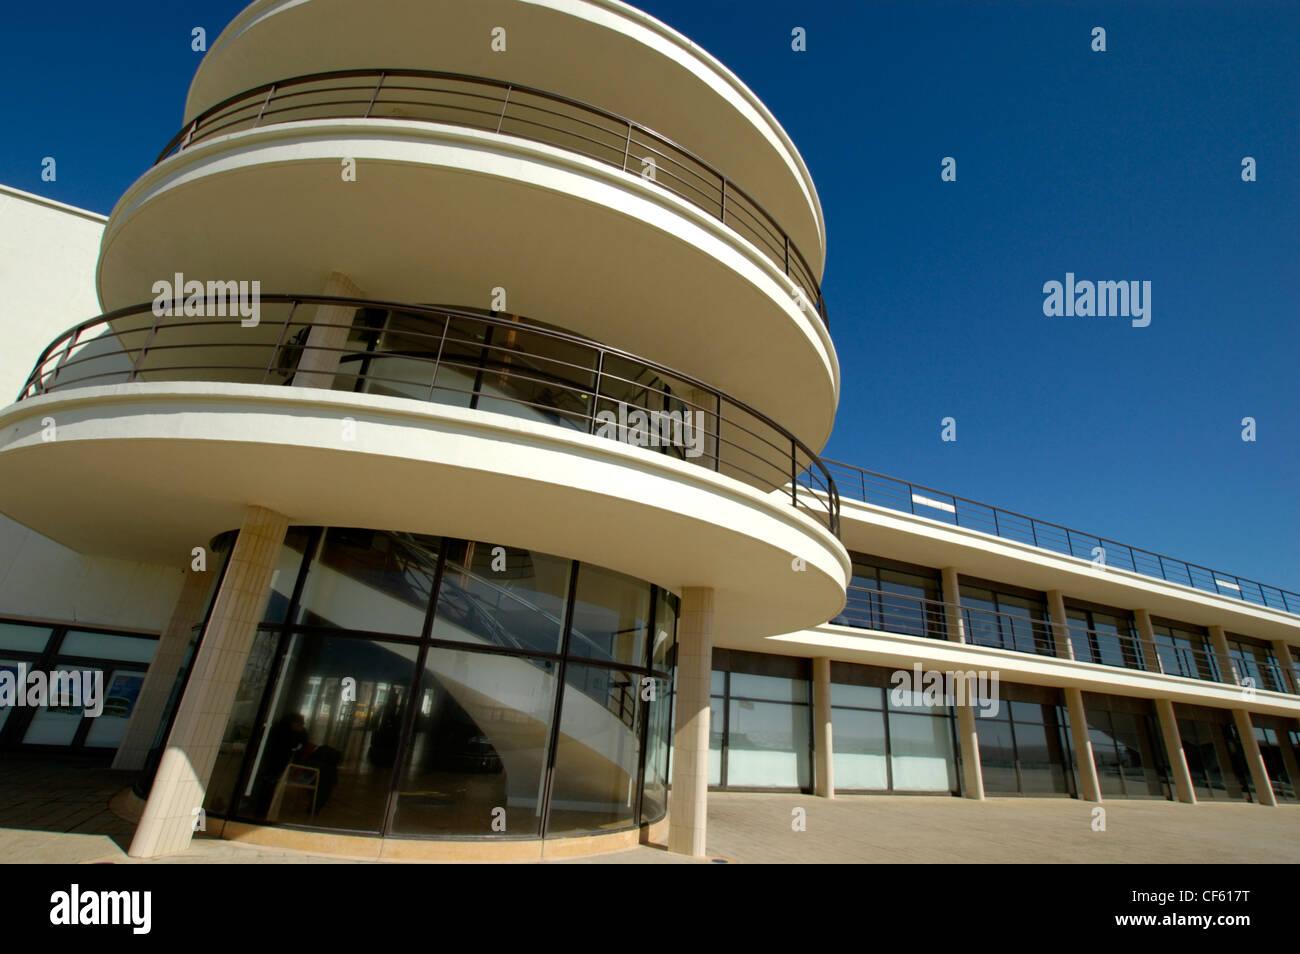 Exterior of the De La Warr Pavillion. The 'art deco' building was designed by Eric Mendelsohn and Serge - Stock Image